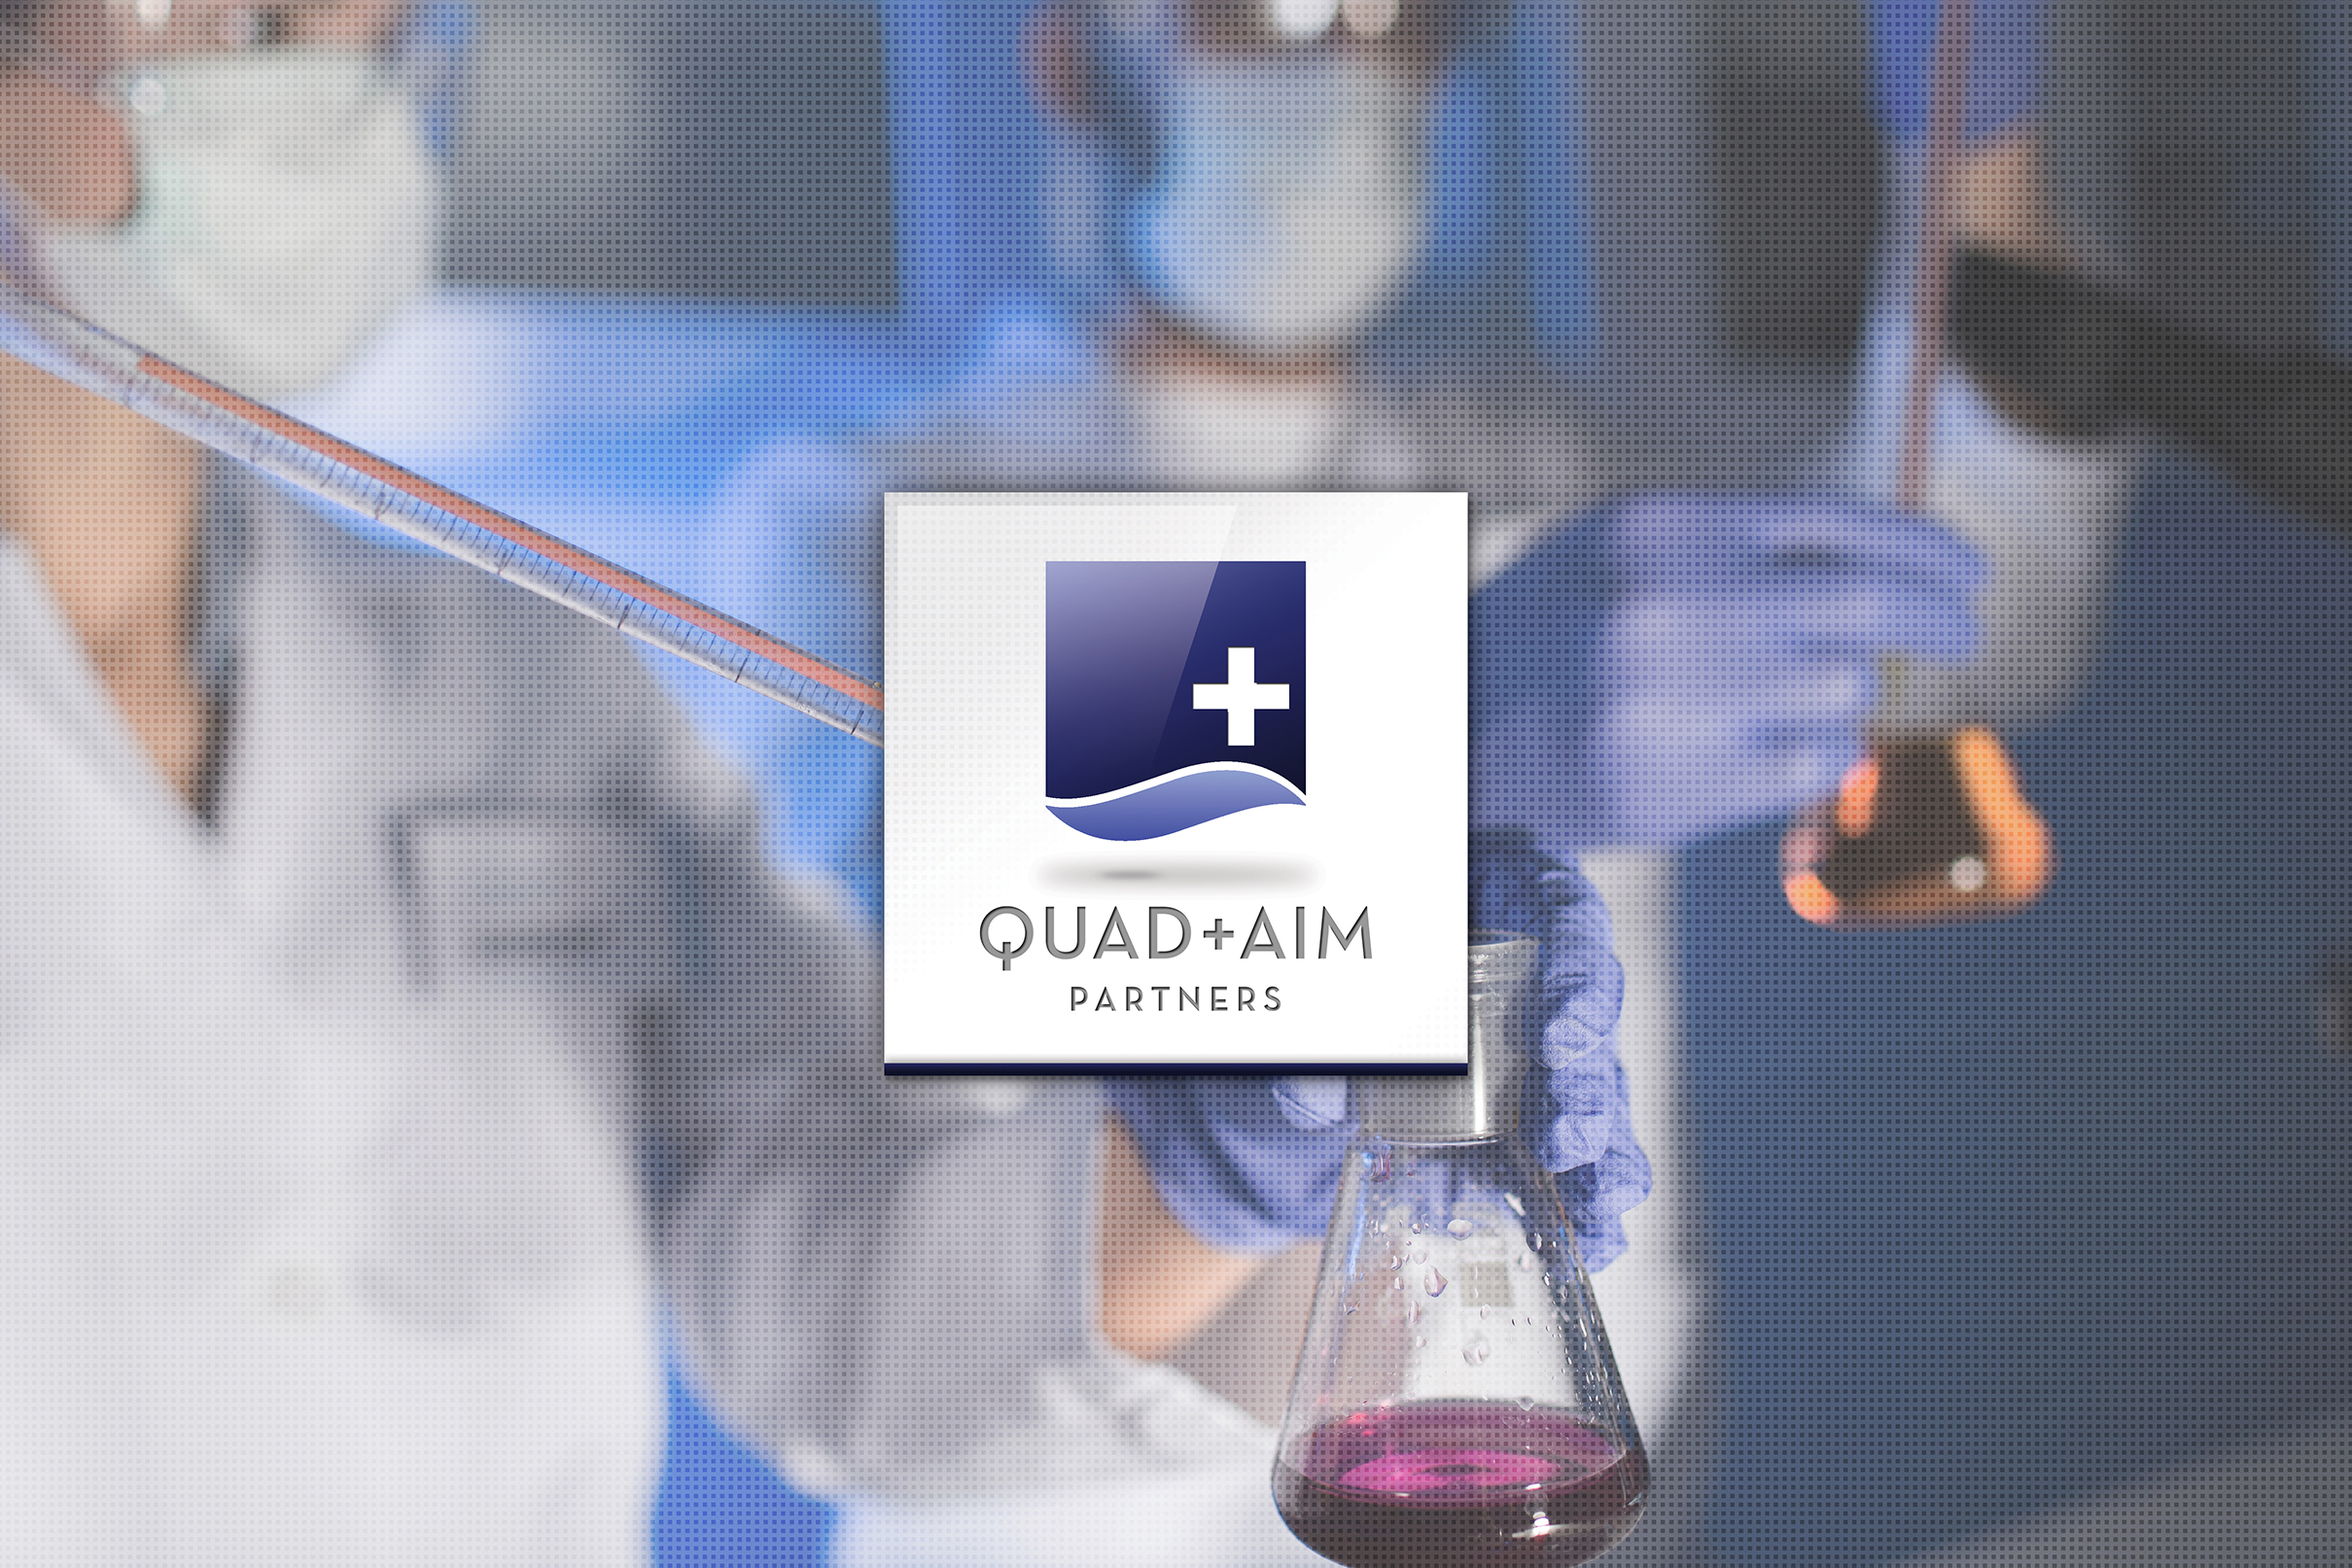 Quad + Aim [at 40] [v5] Landing Page Image by Graham Hnedak Brand G Creative 05 May 2016.jpg